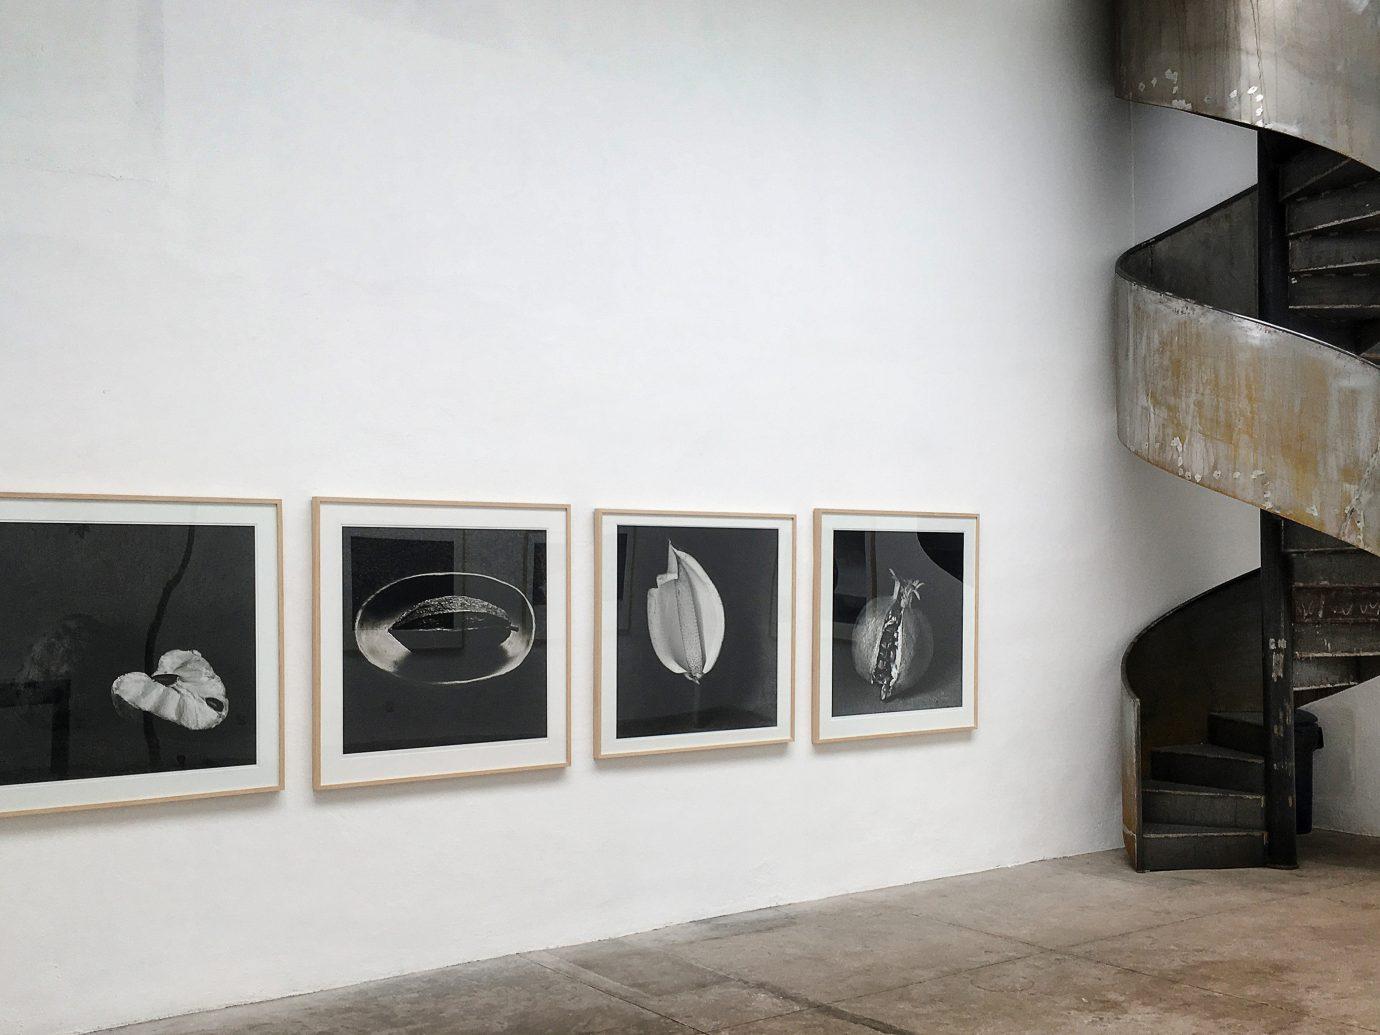 City Mexico City Trip Ideas indoor floor exhibition furniture product design interior design shelving shelf room